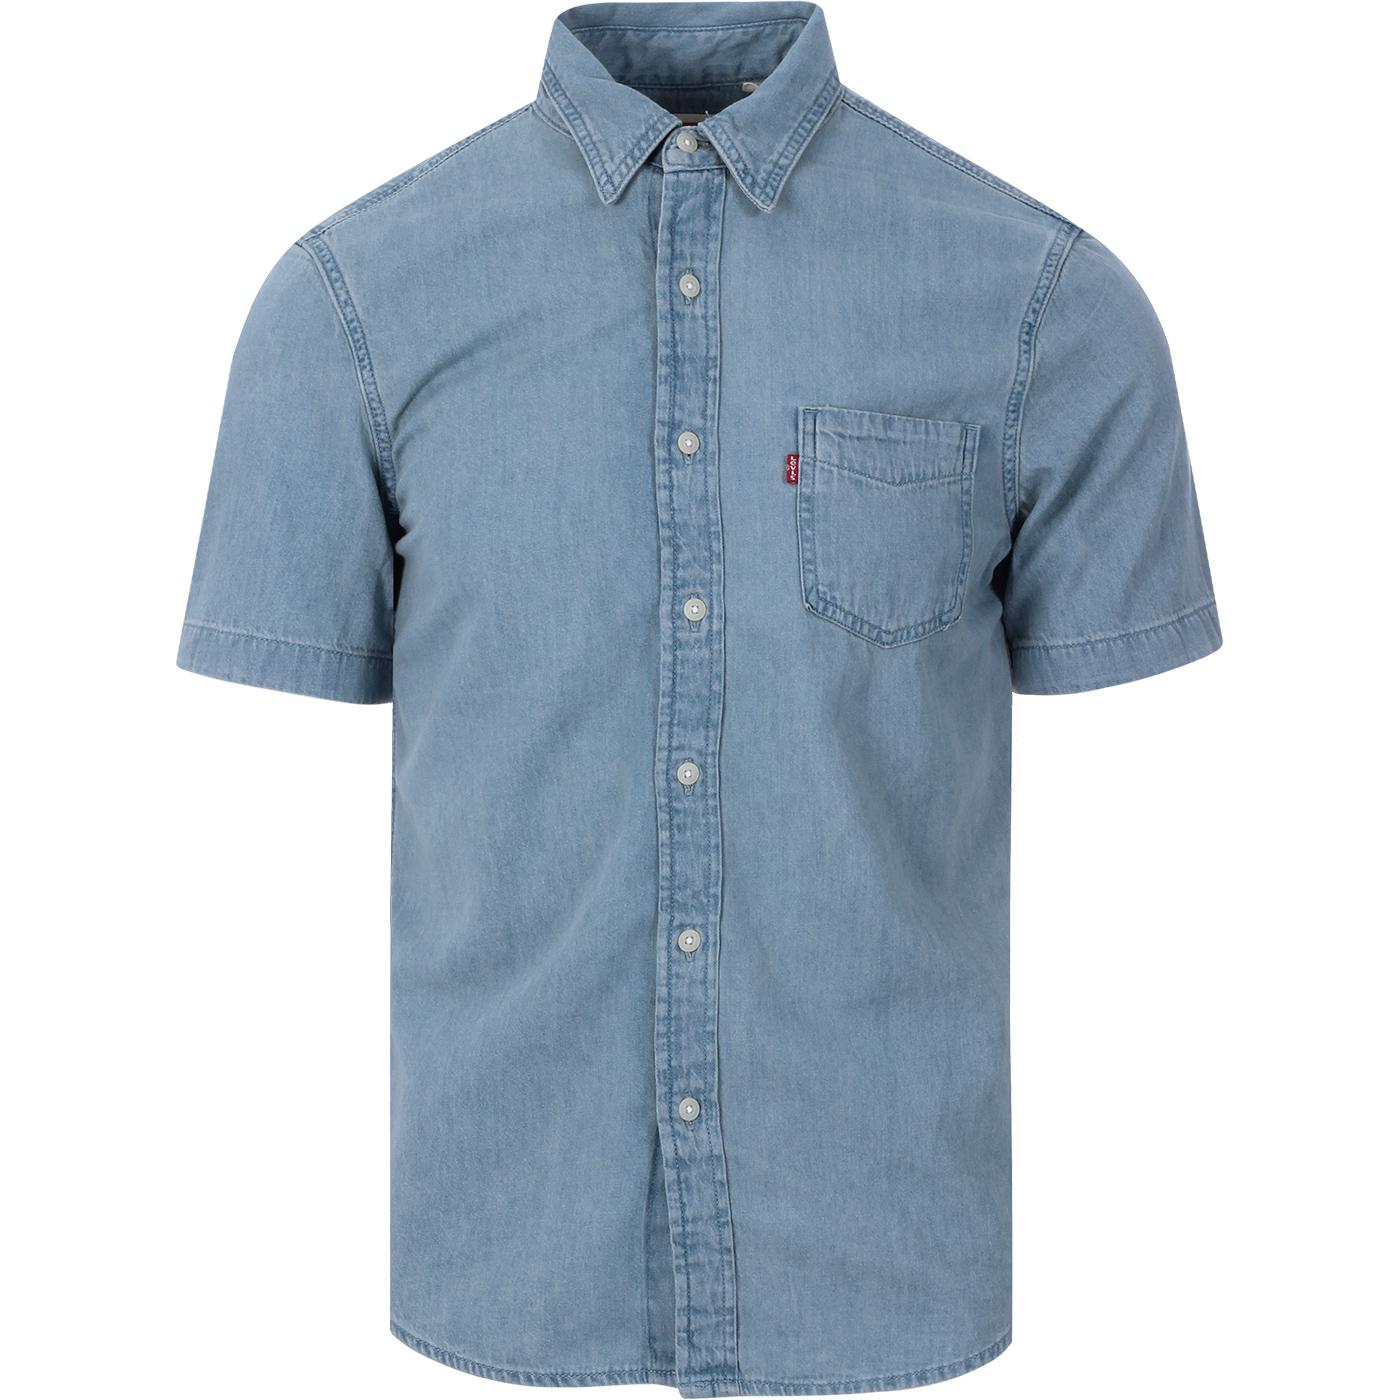 LEVI'S SS Classic 1 Pocket Denim Shirt (RCS)